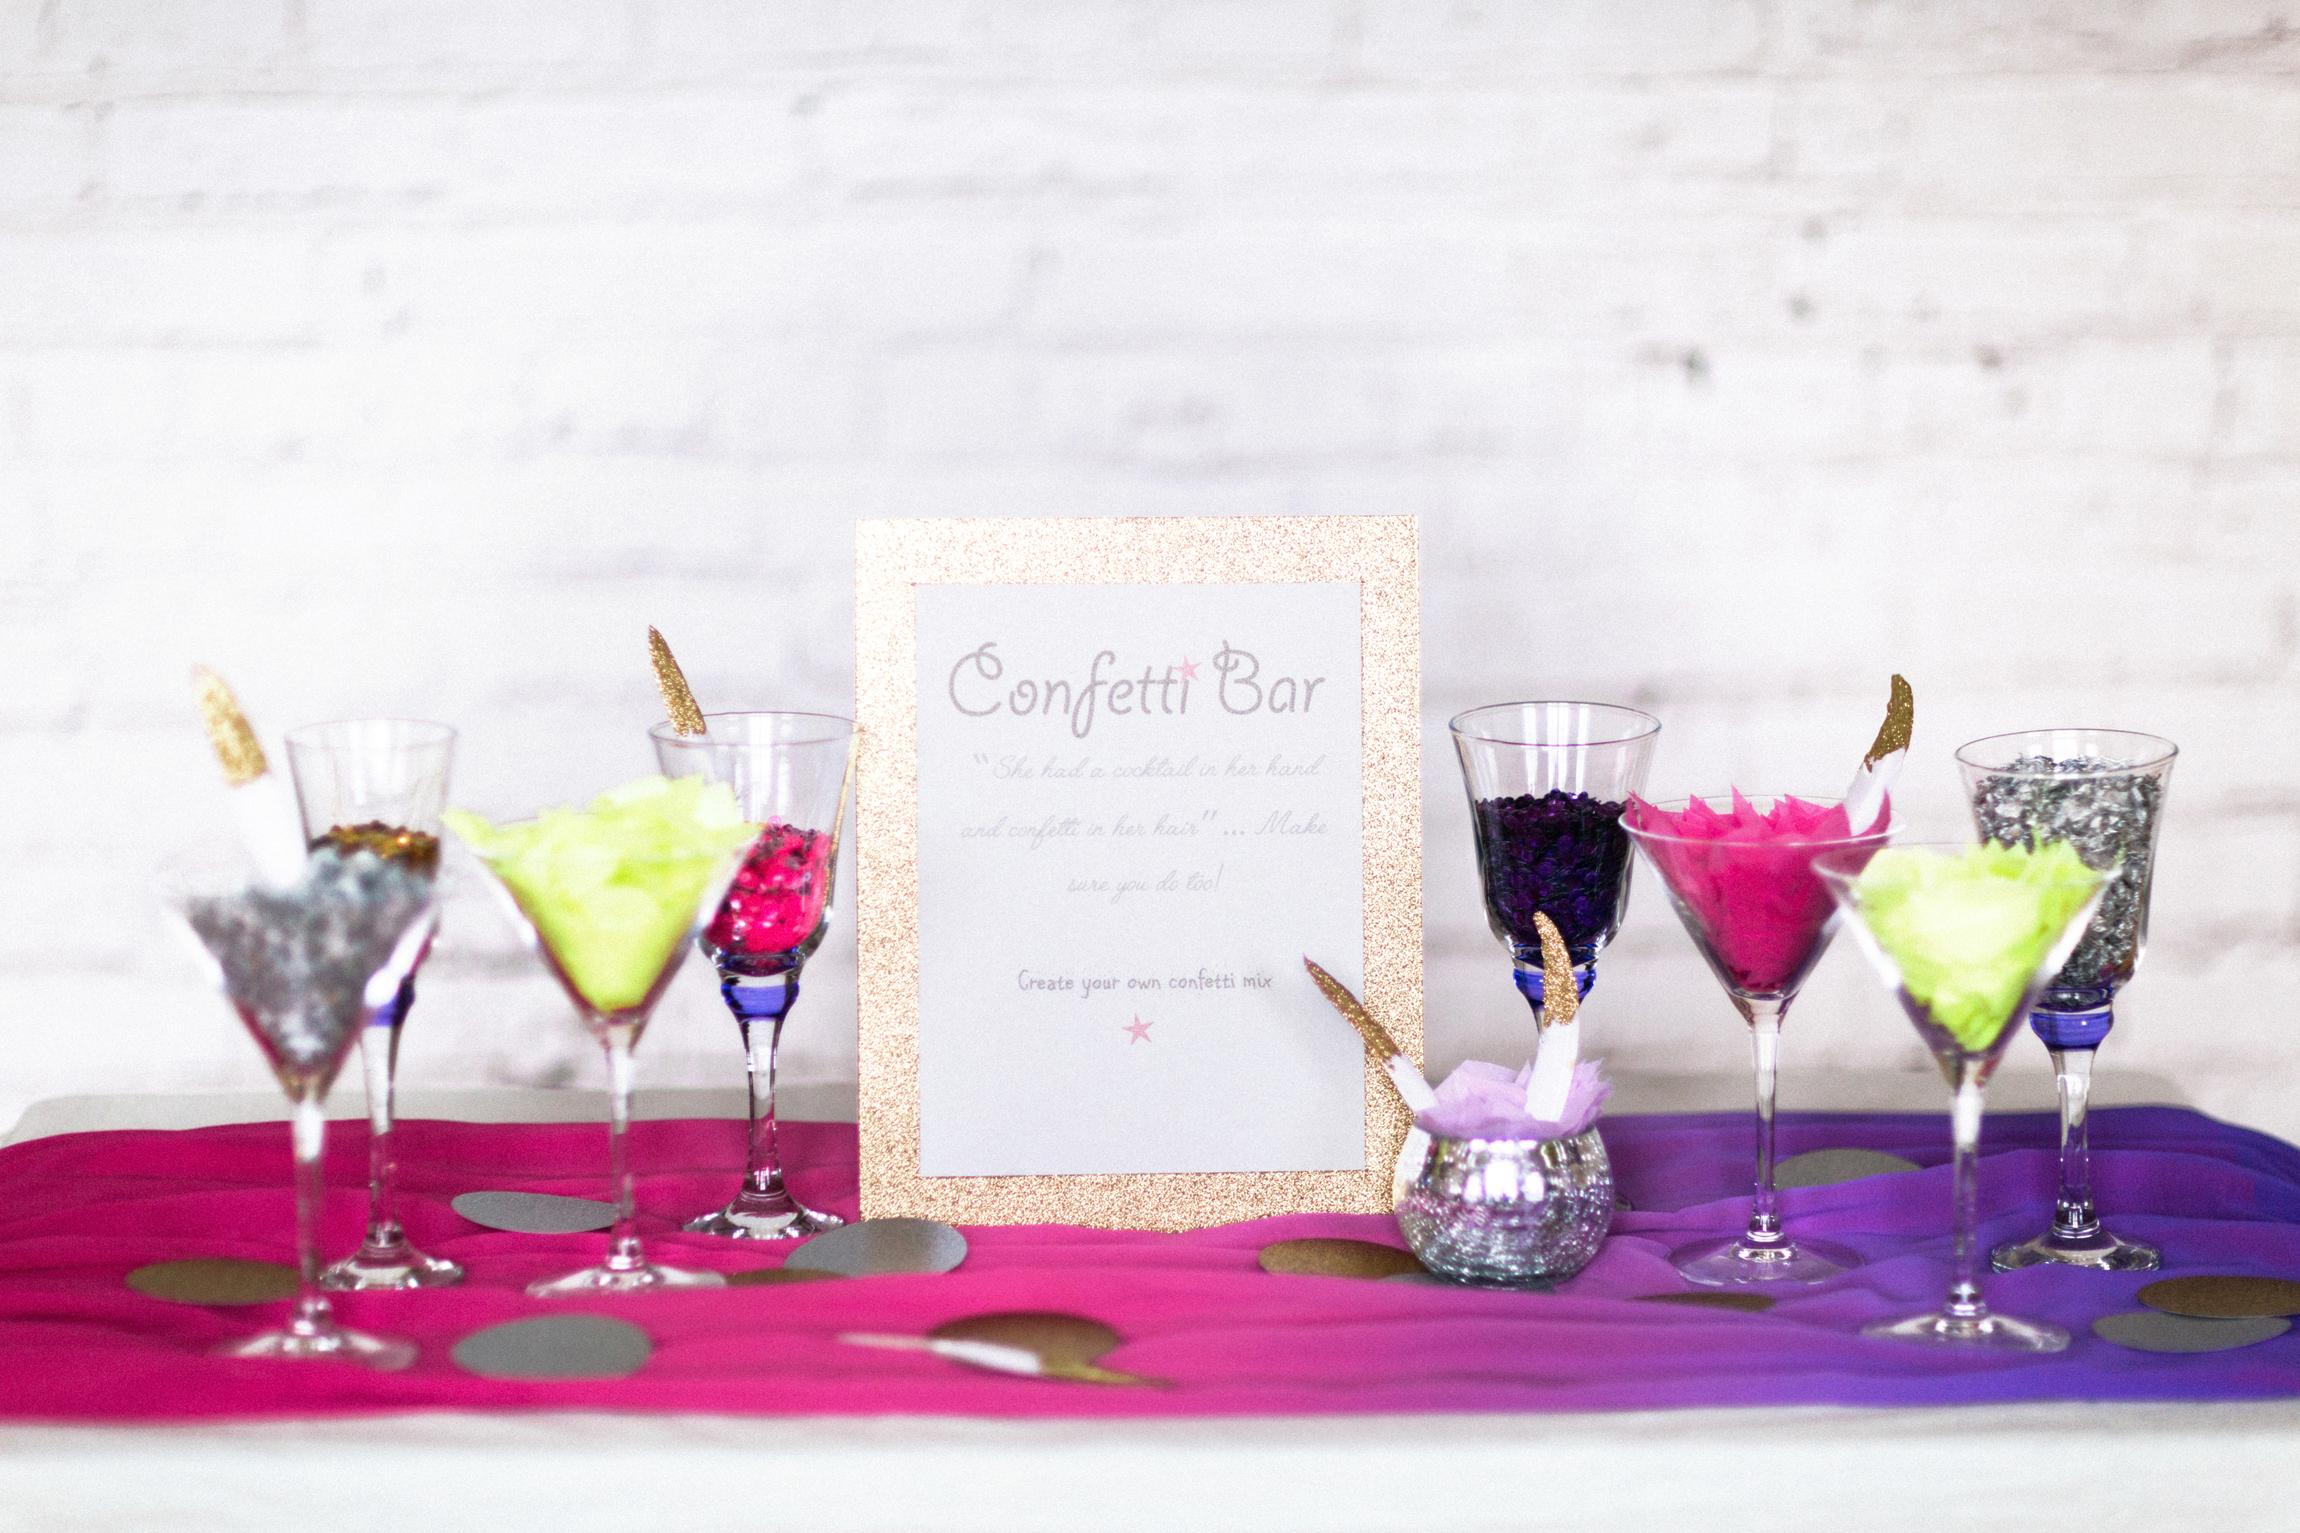 Confetti Bride Inspiration by Miss Munro and Sanshine Photography (1).jpg